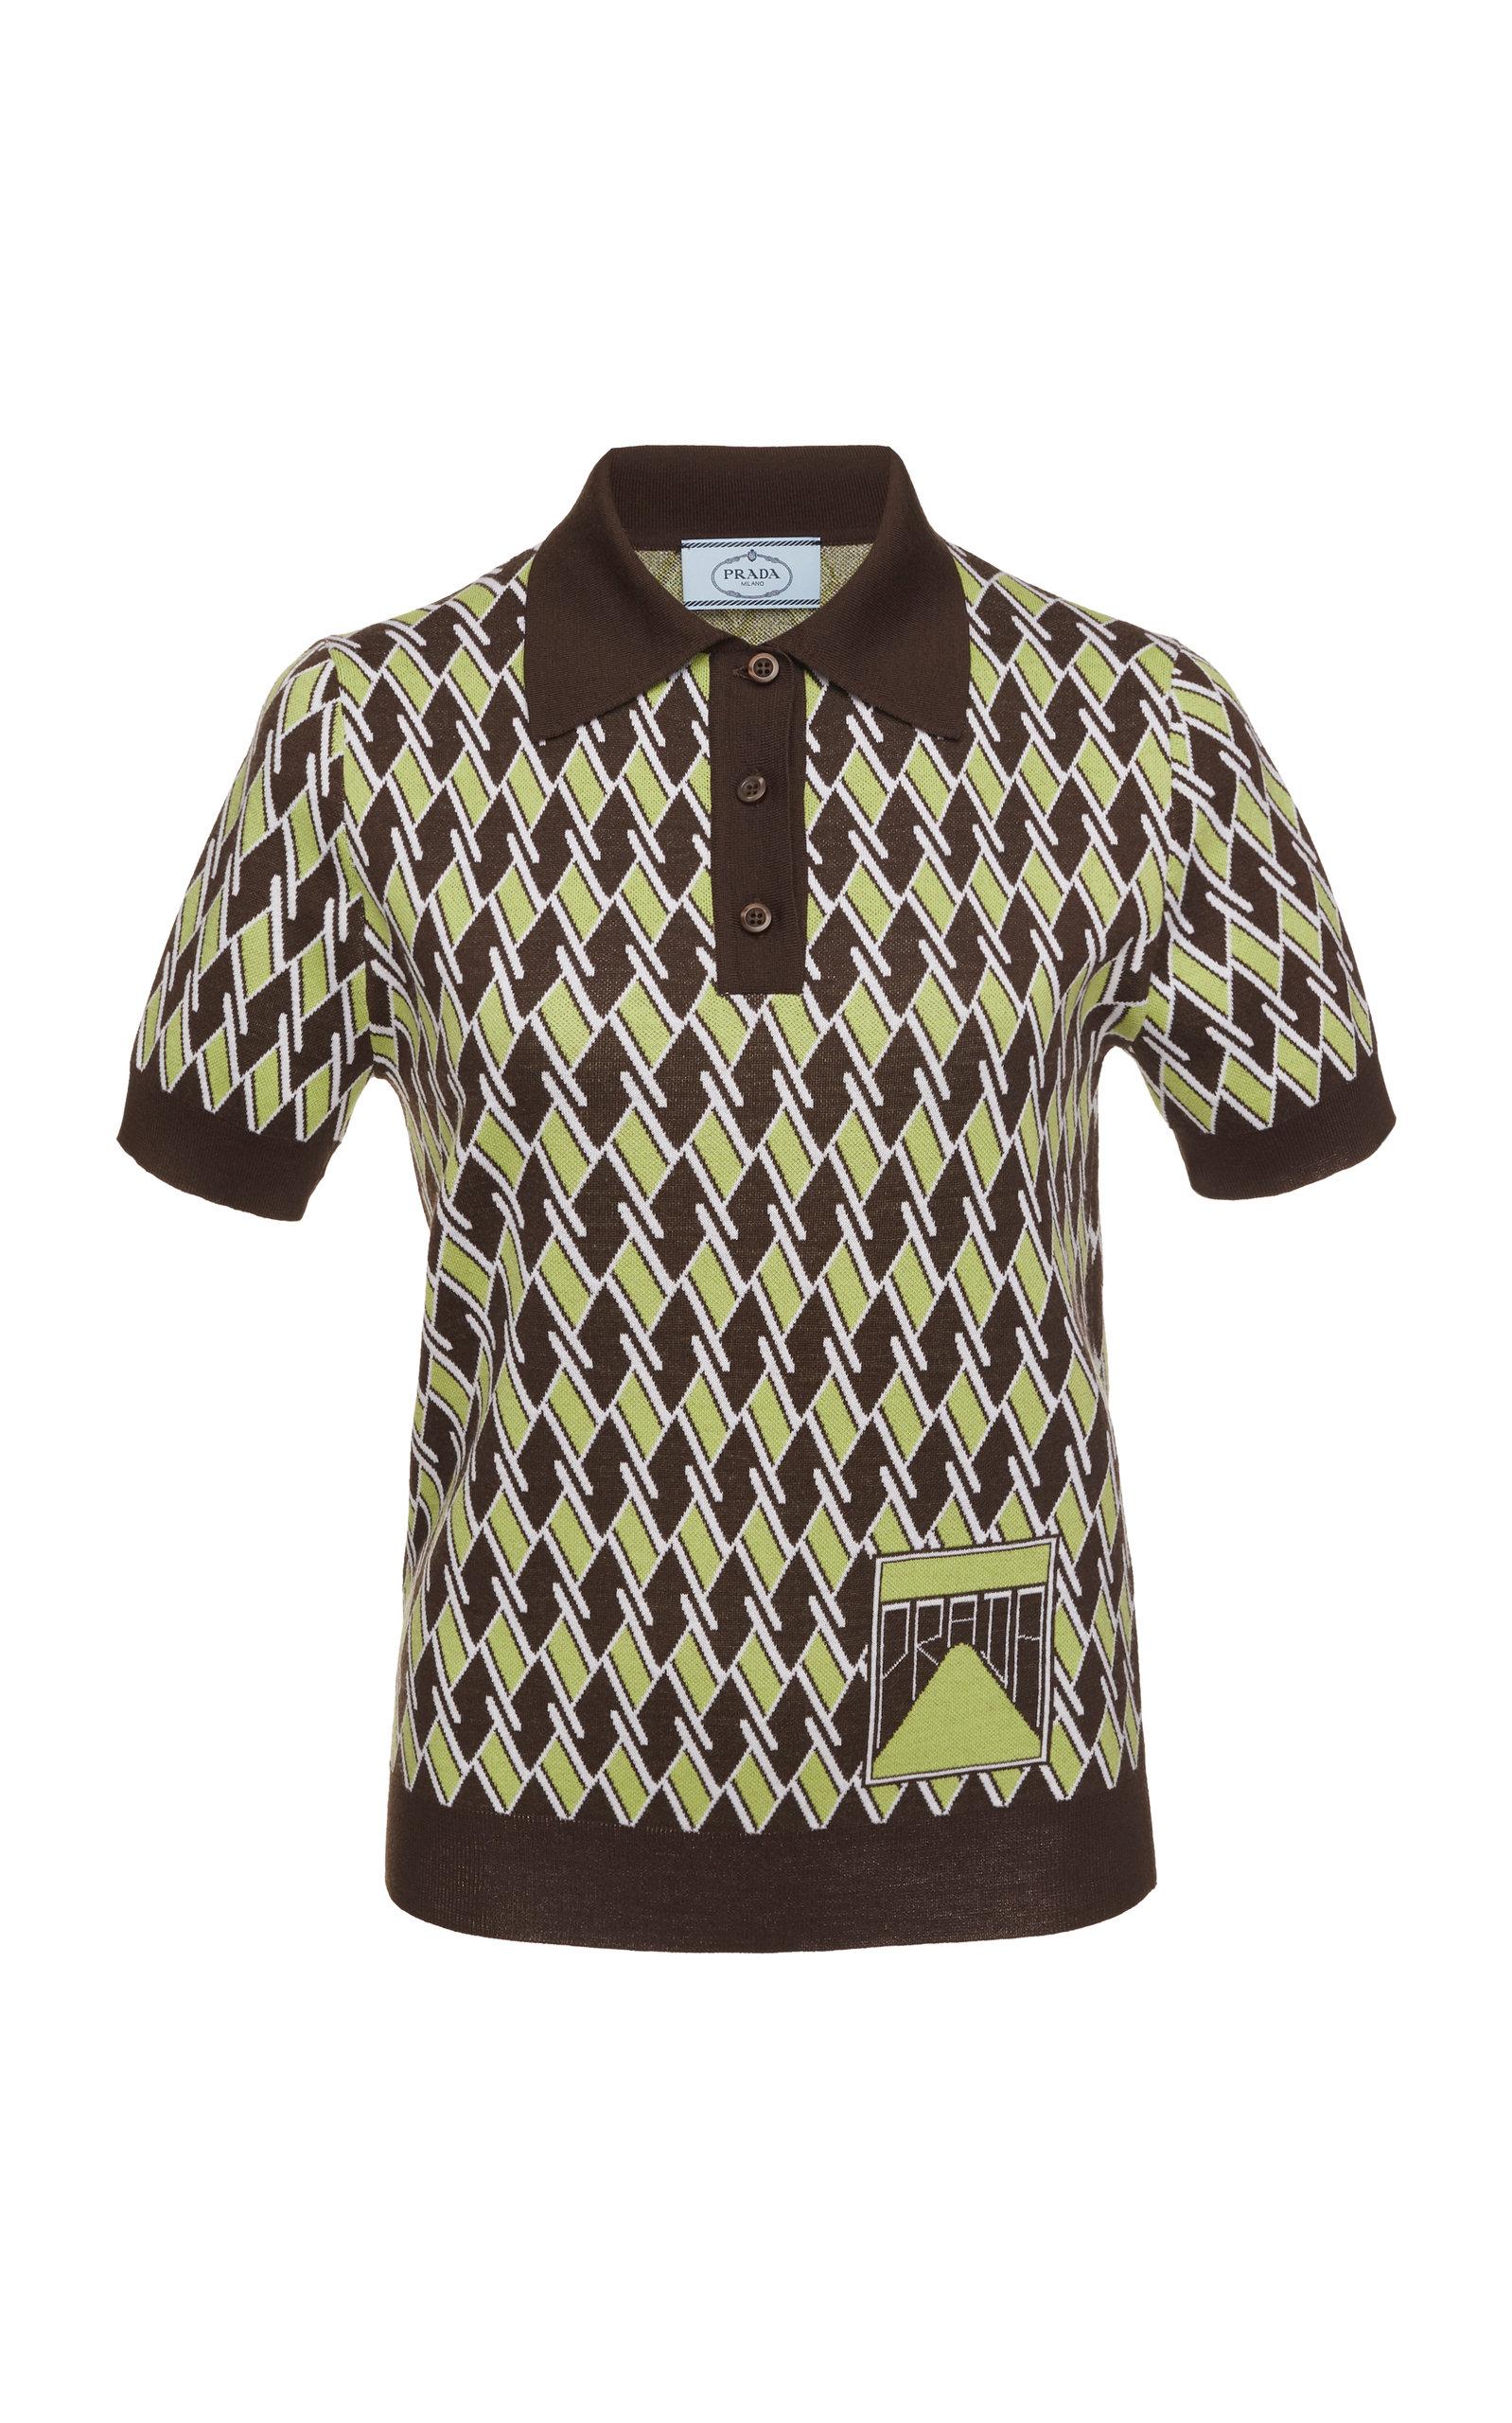 Prada Printed Polo Shirt In Brown Modesens